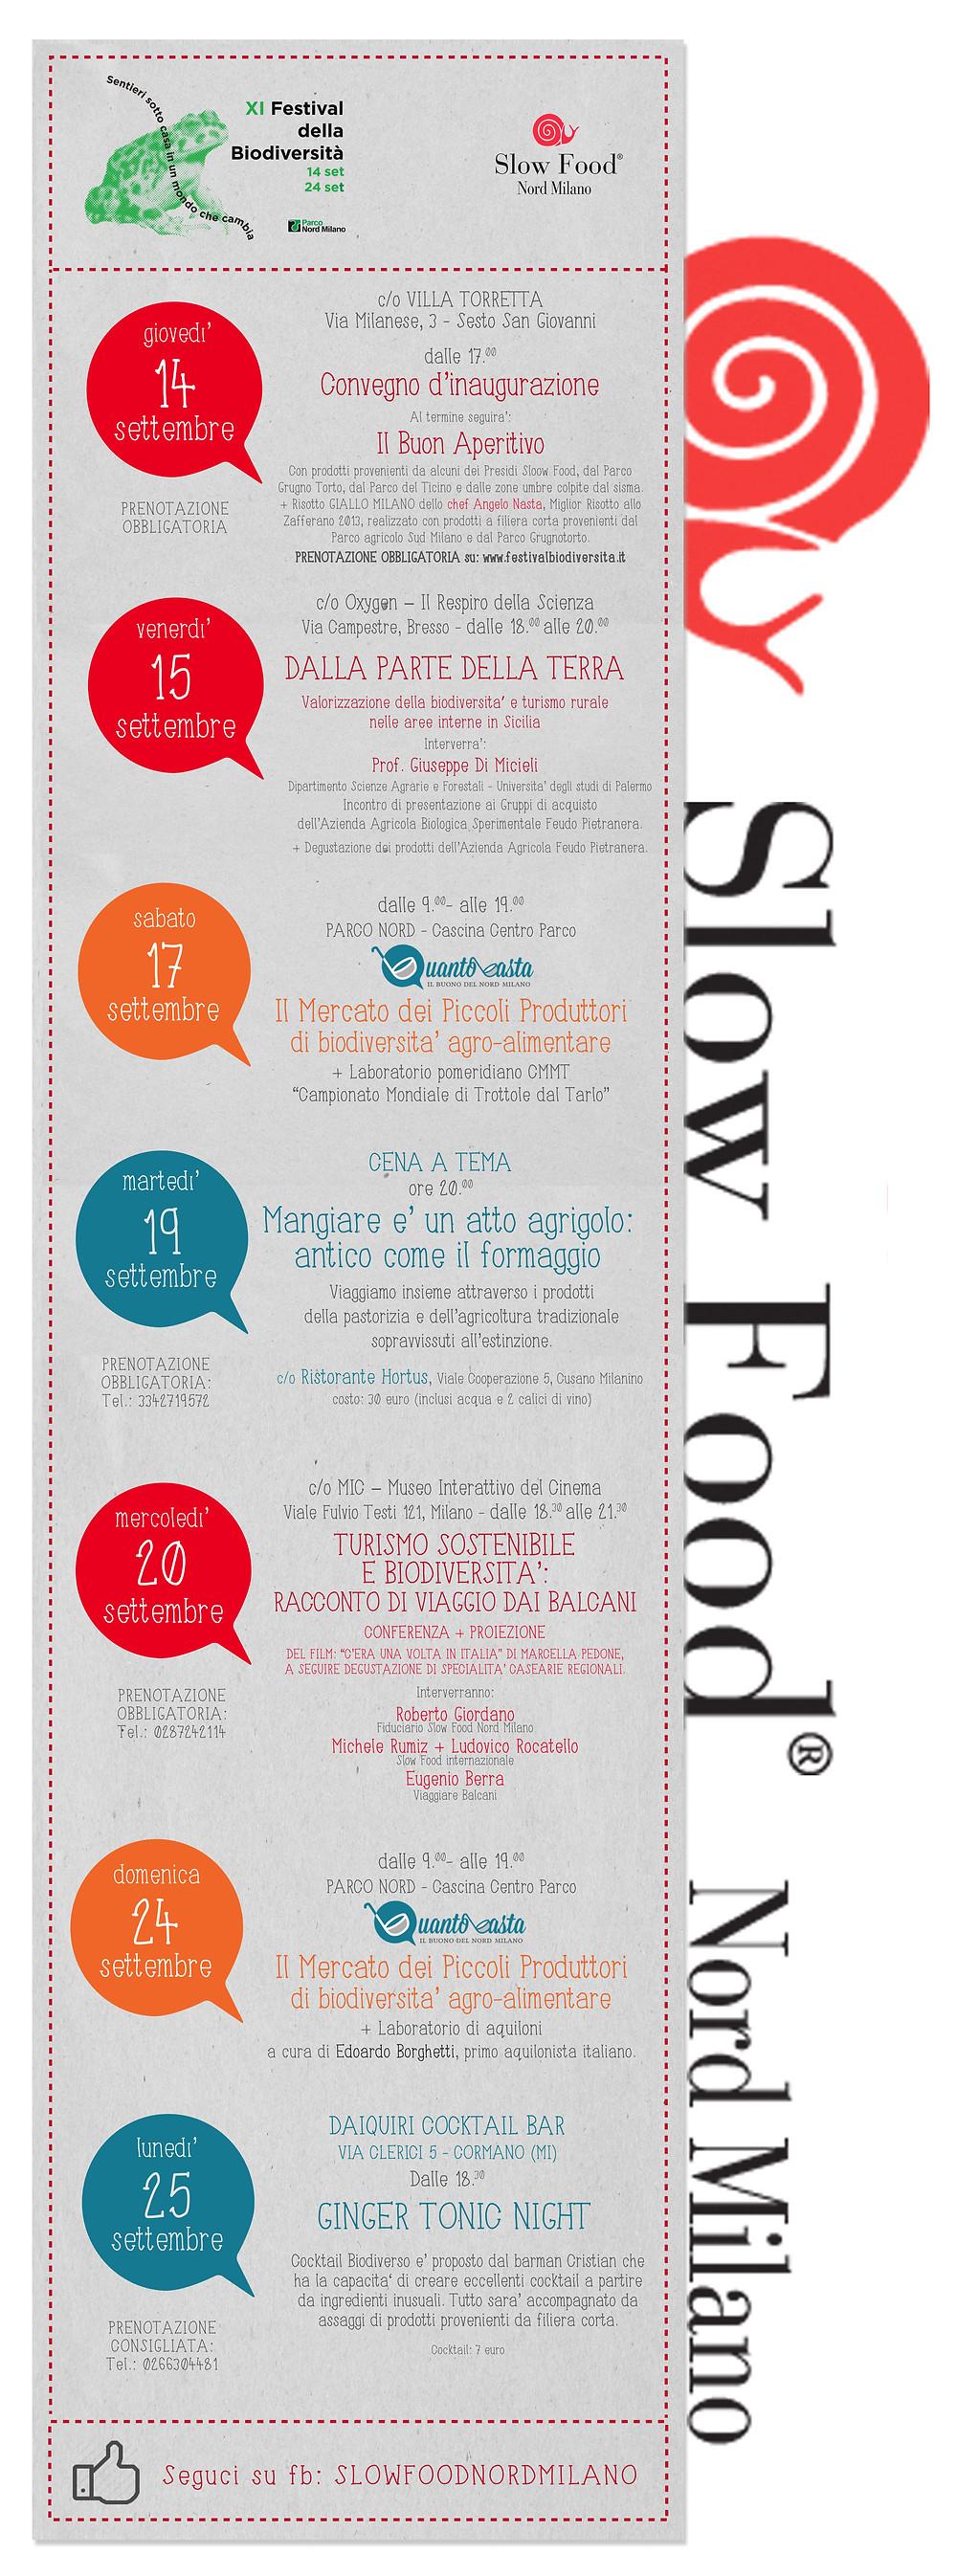 SLOW FOOD NORD MILANO FESTIVAL BIODIVERSITA 2017